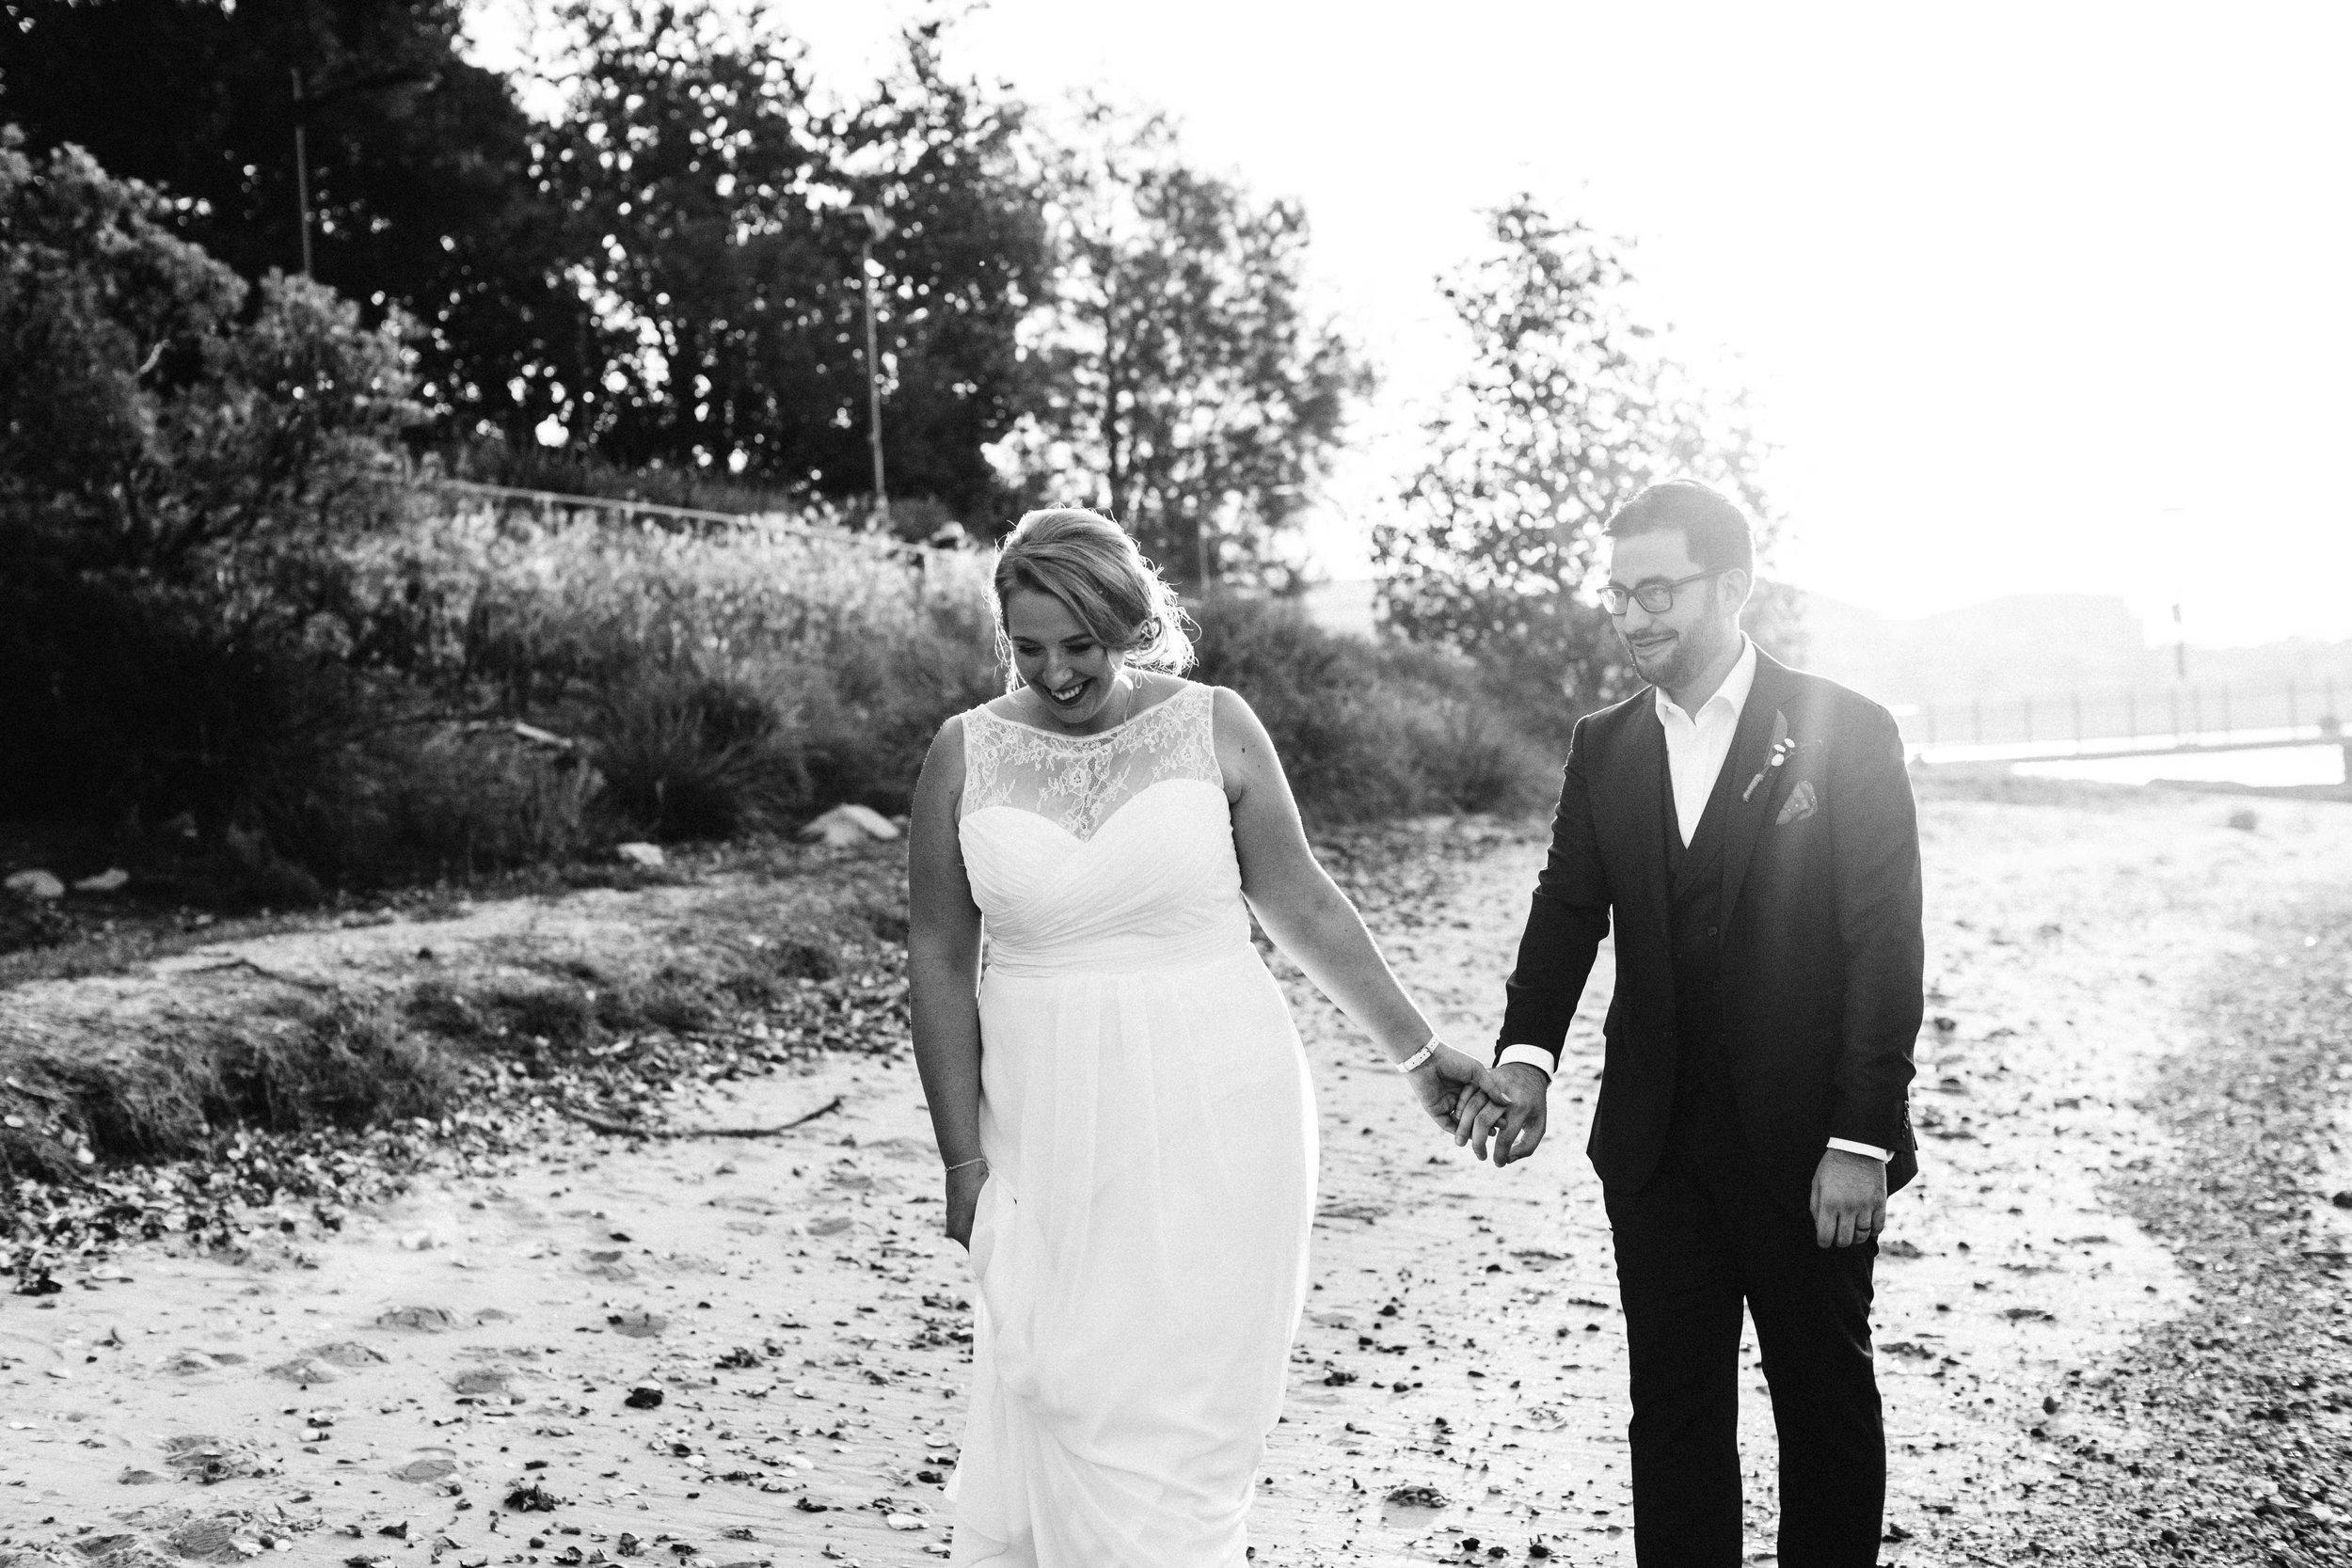 cabarita-park-sydney-wedding-emilyobrienphotography.net-47.jpg